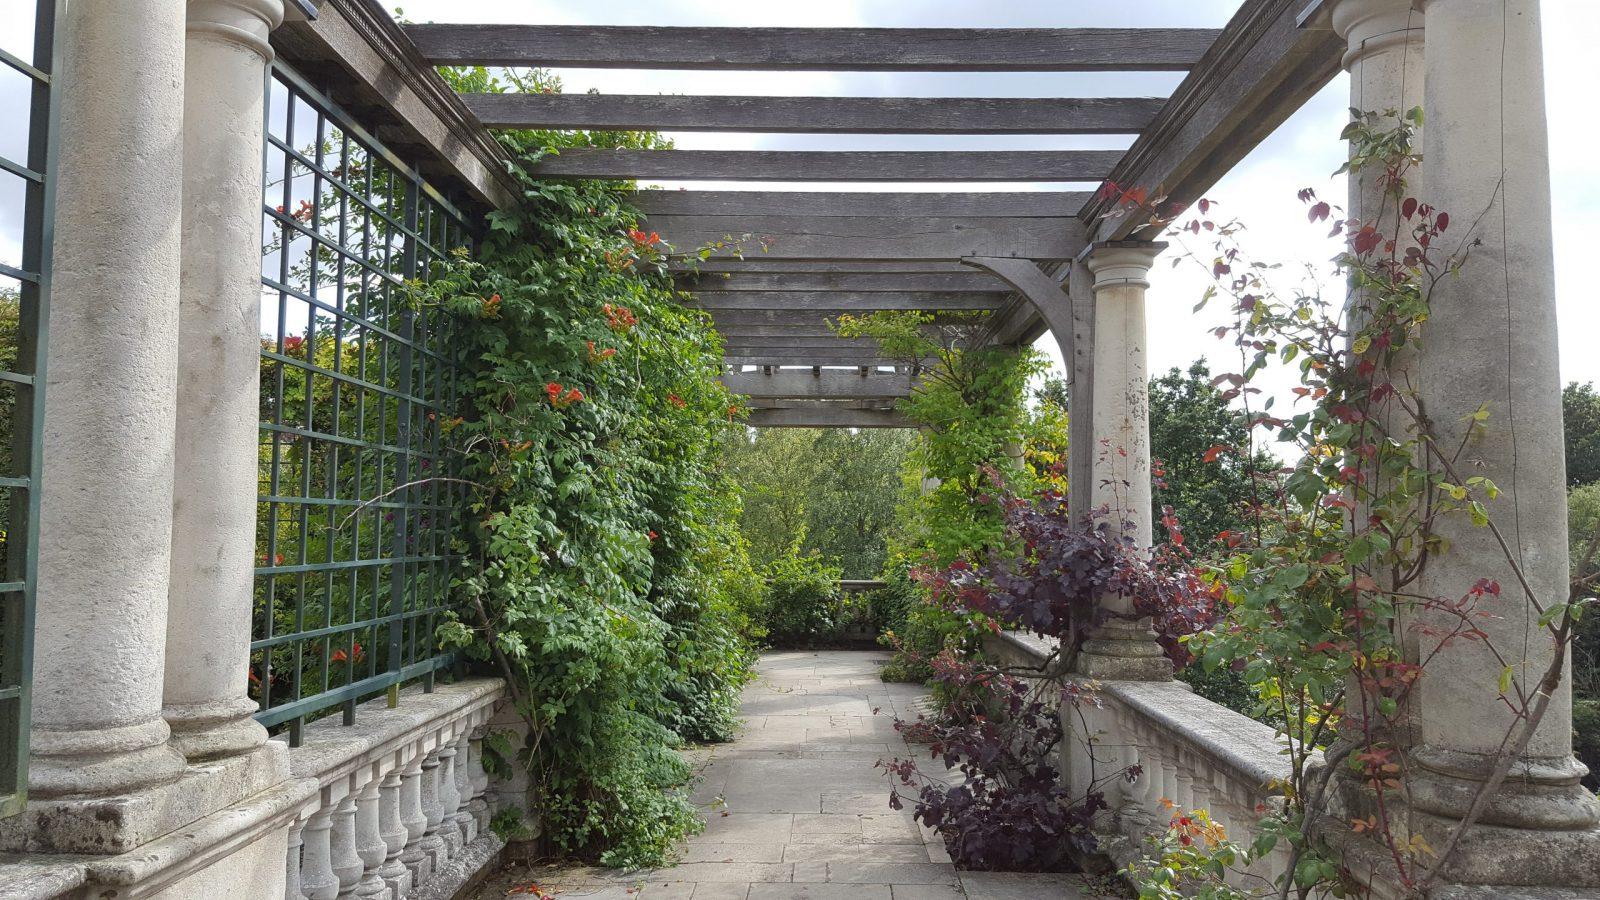 Visiting Hill Garden & Pergola, Hampstead Heath: Photo Gallery 21